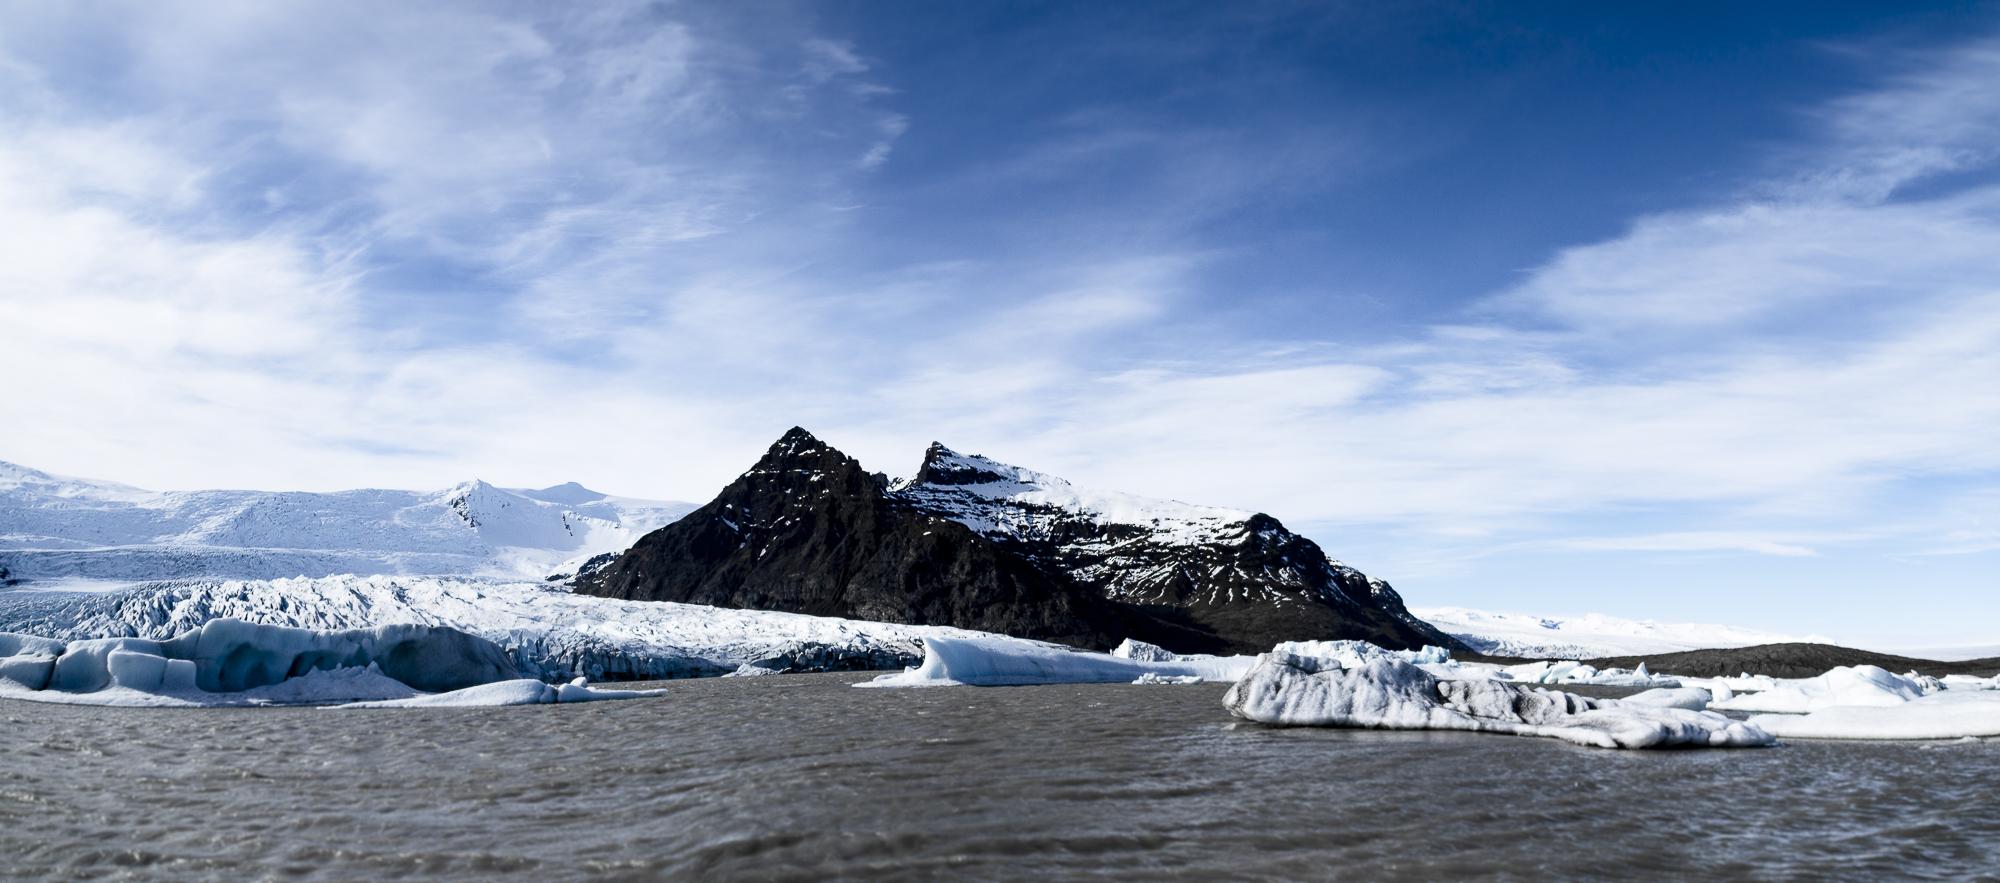 Ankit_Iceland-2720-Pano.jpg